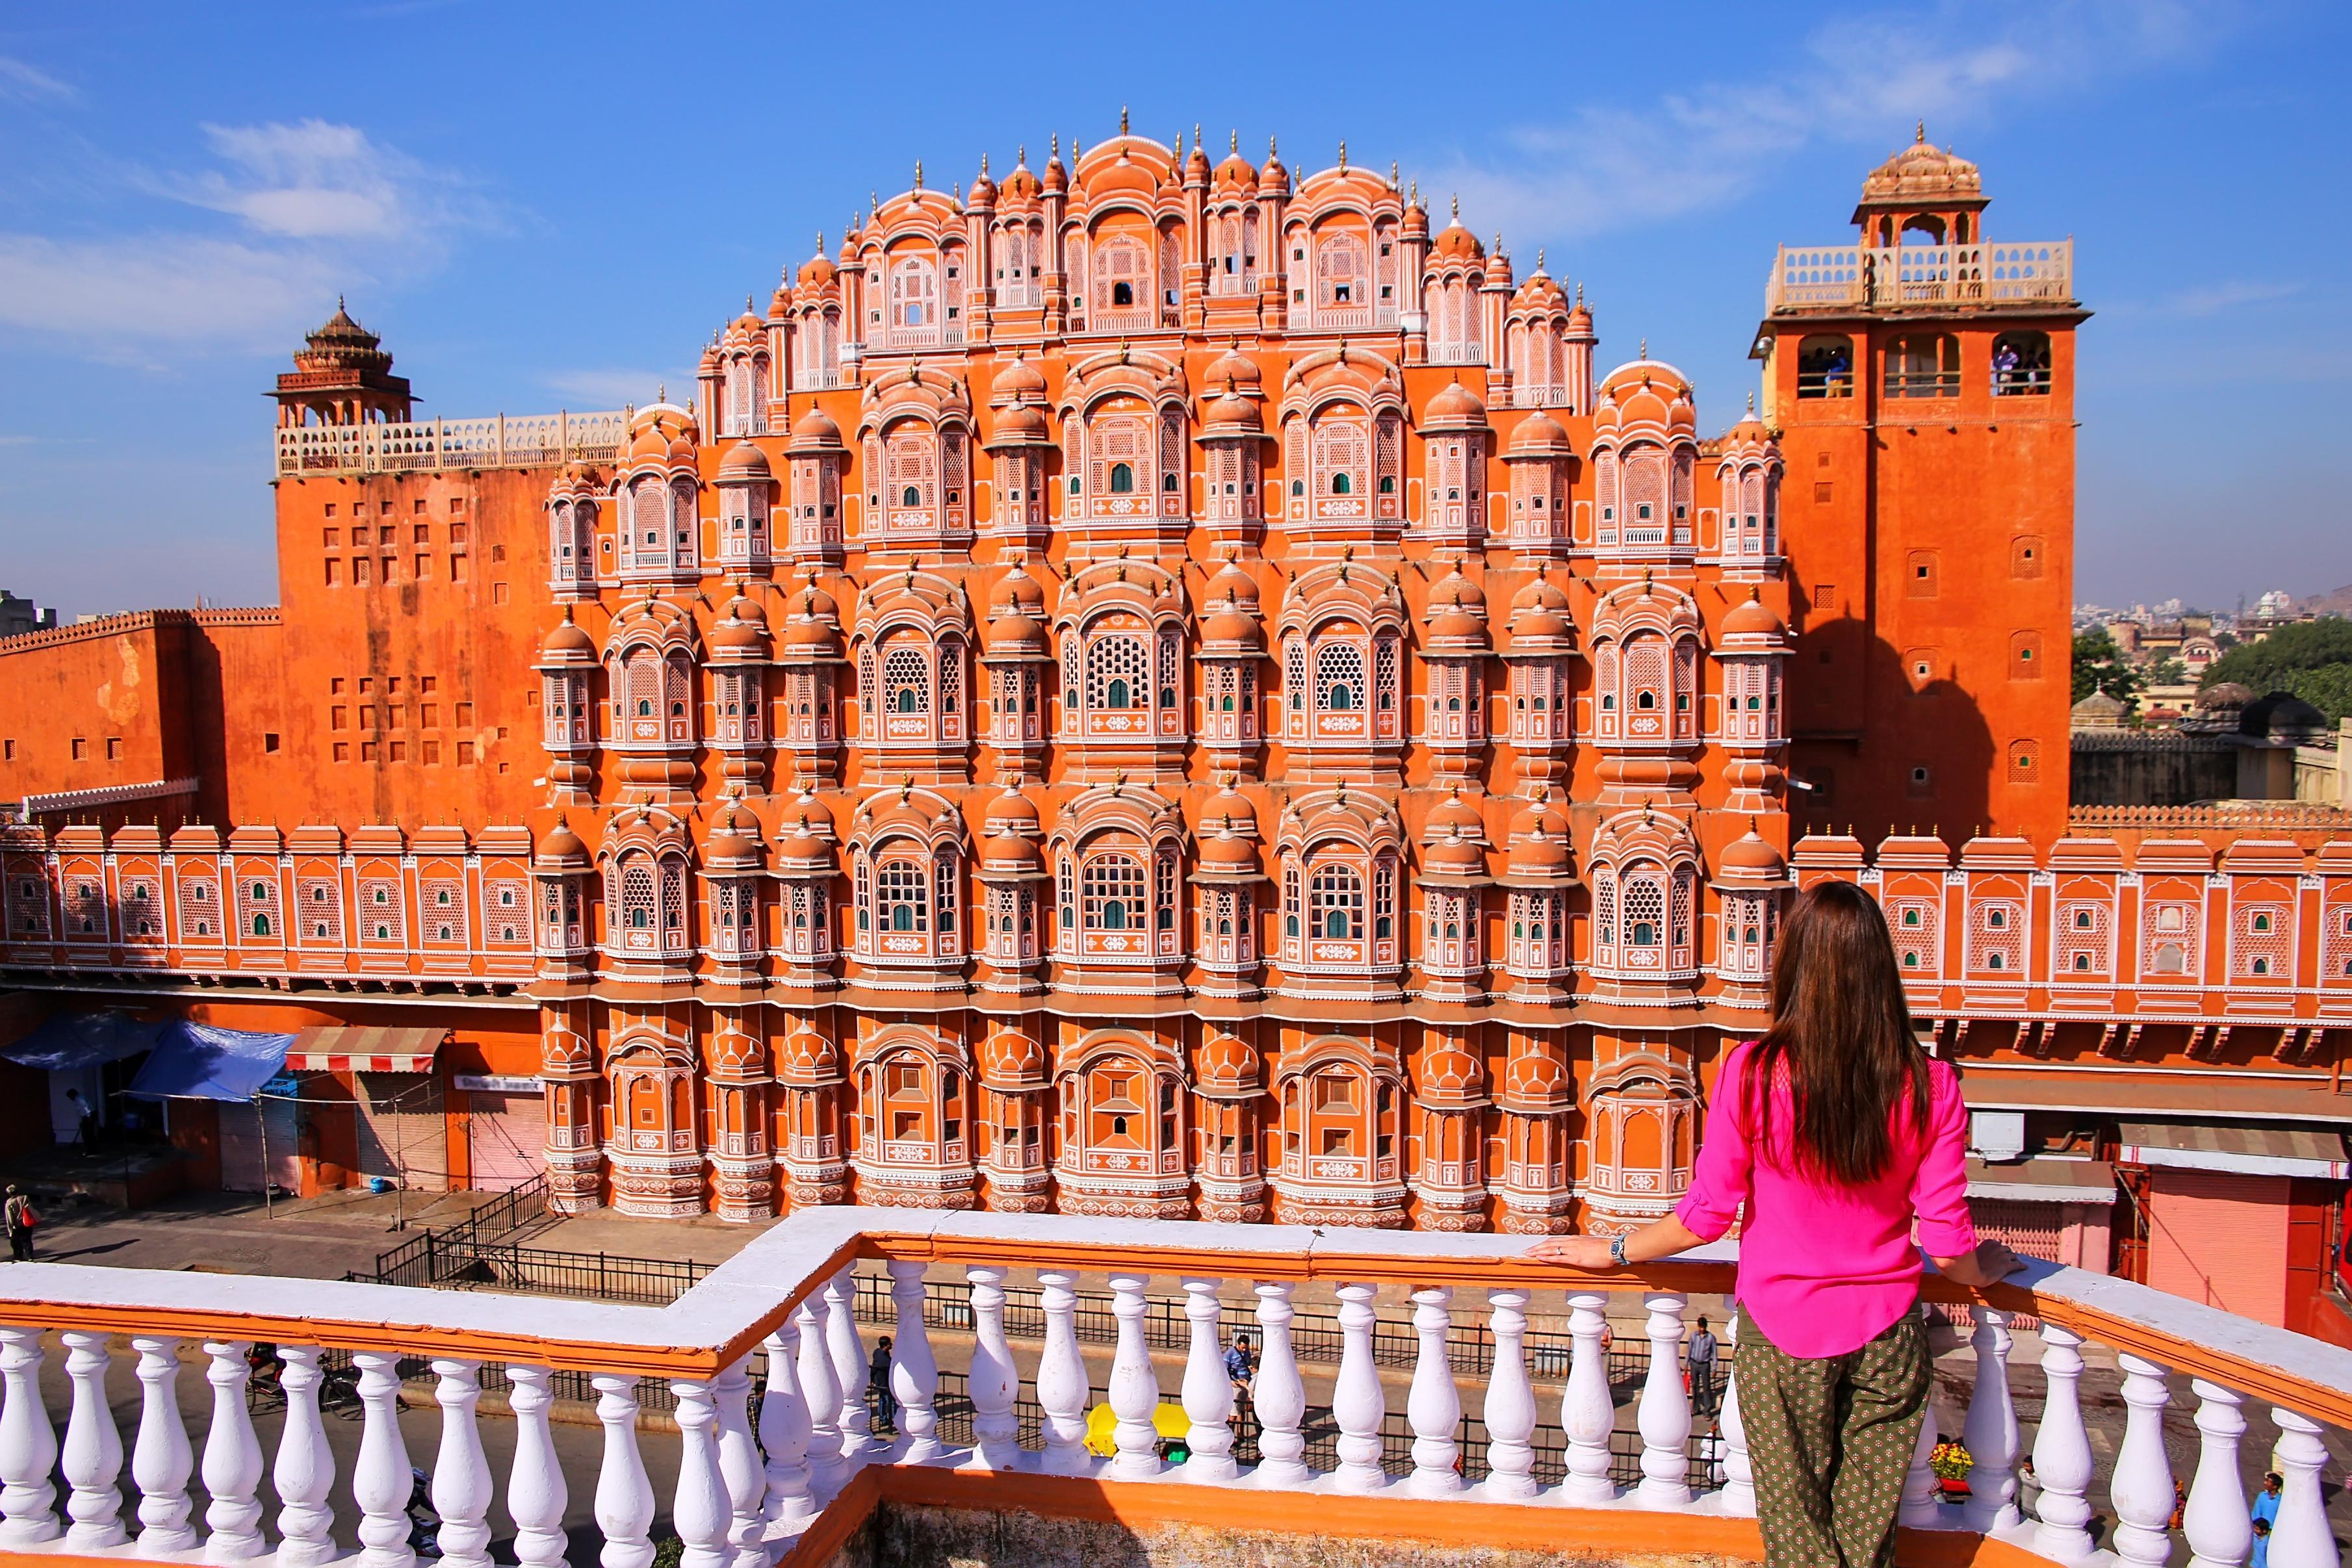 Gate 1 Travel Canada Christmas 2021 10 Best India Tours Trips 2021 2022 Tourradar